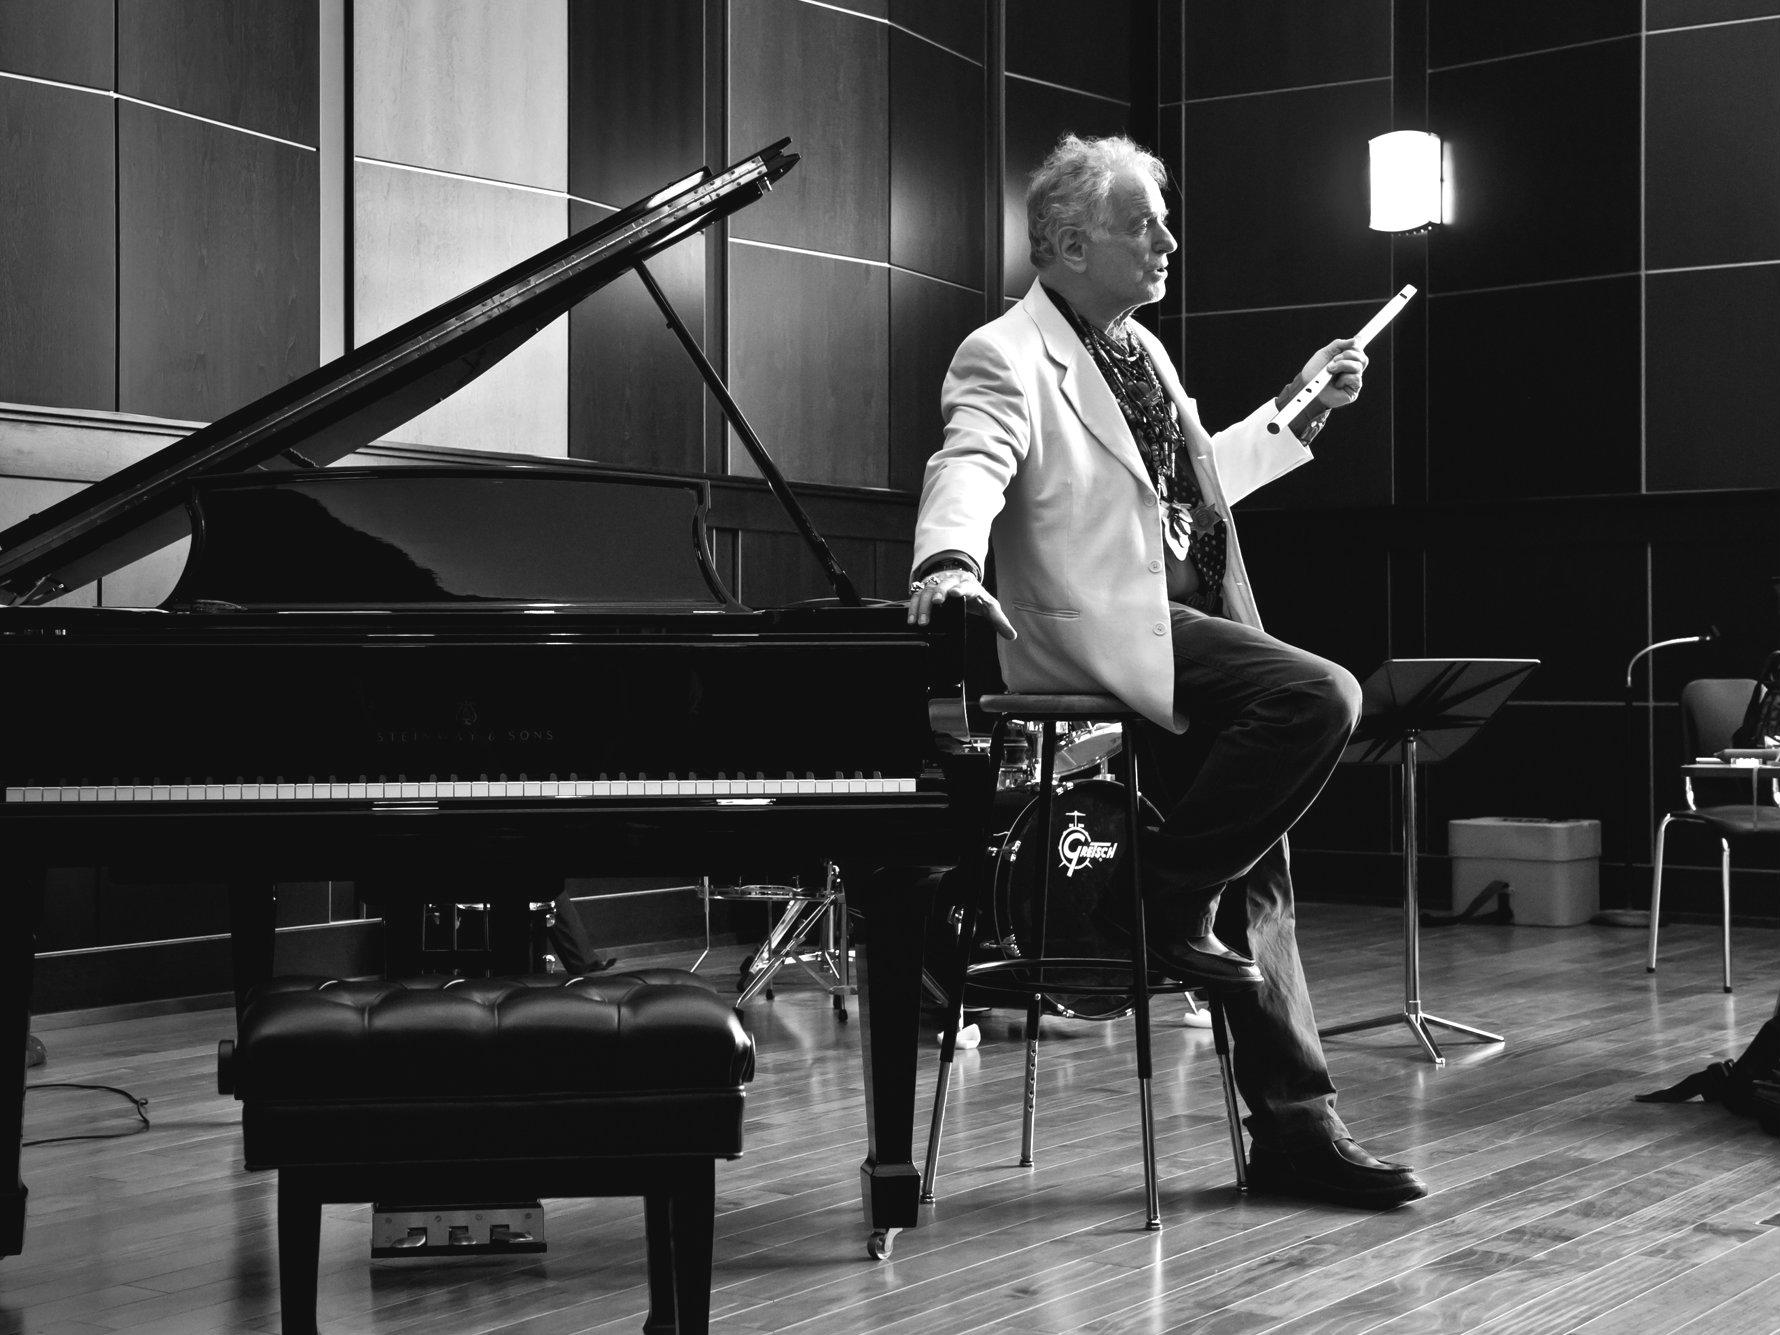 Photo: Composer David Amram teaching a master class